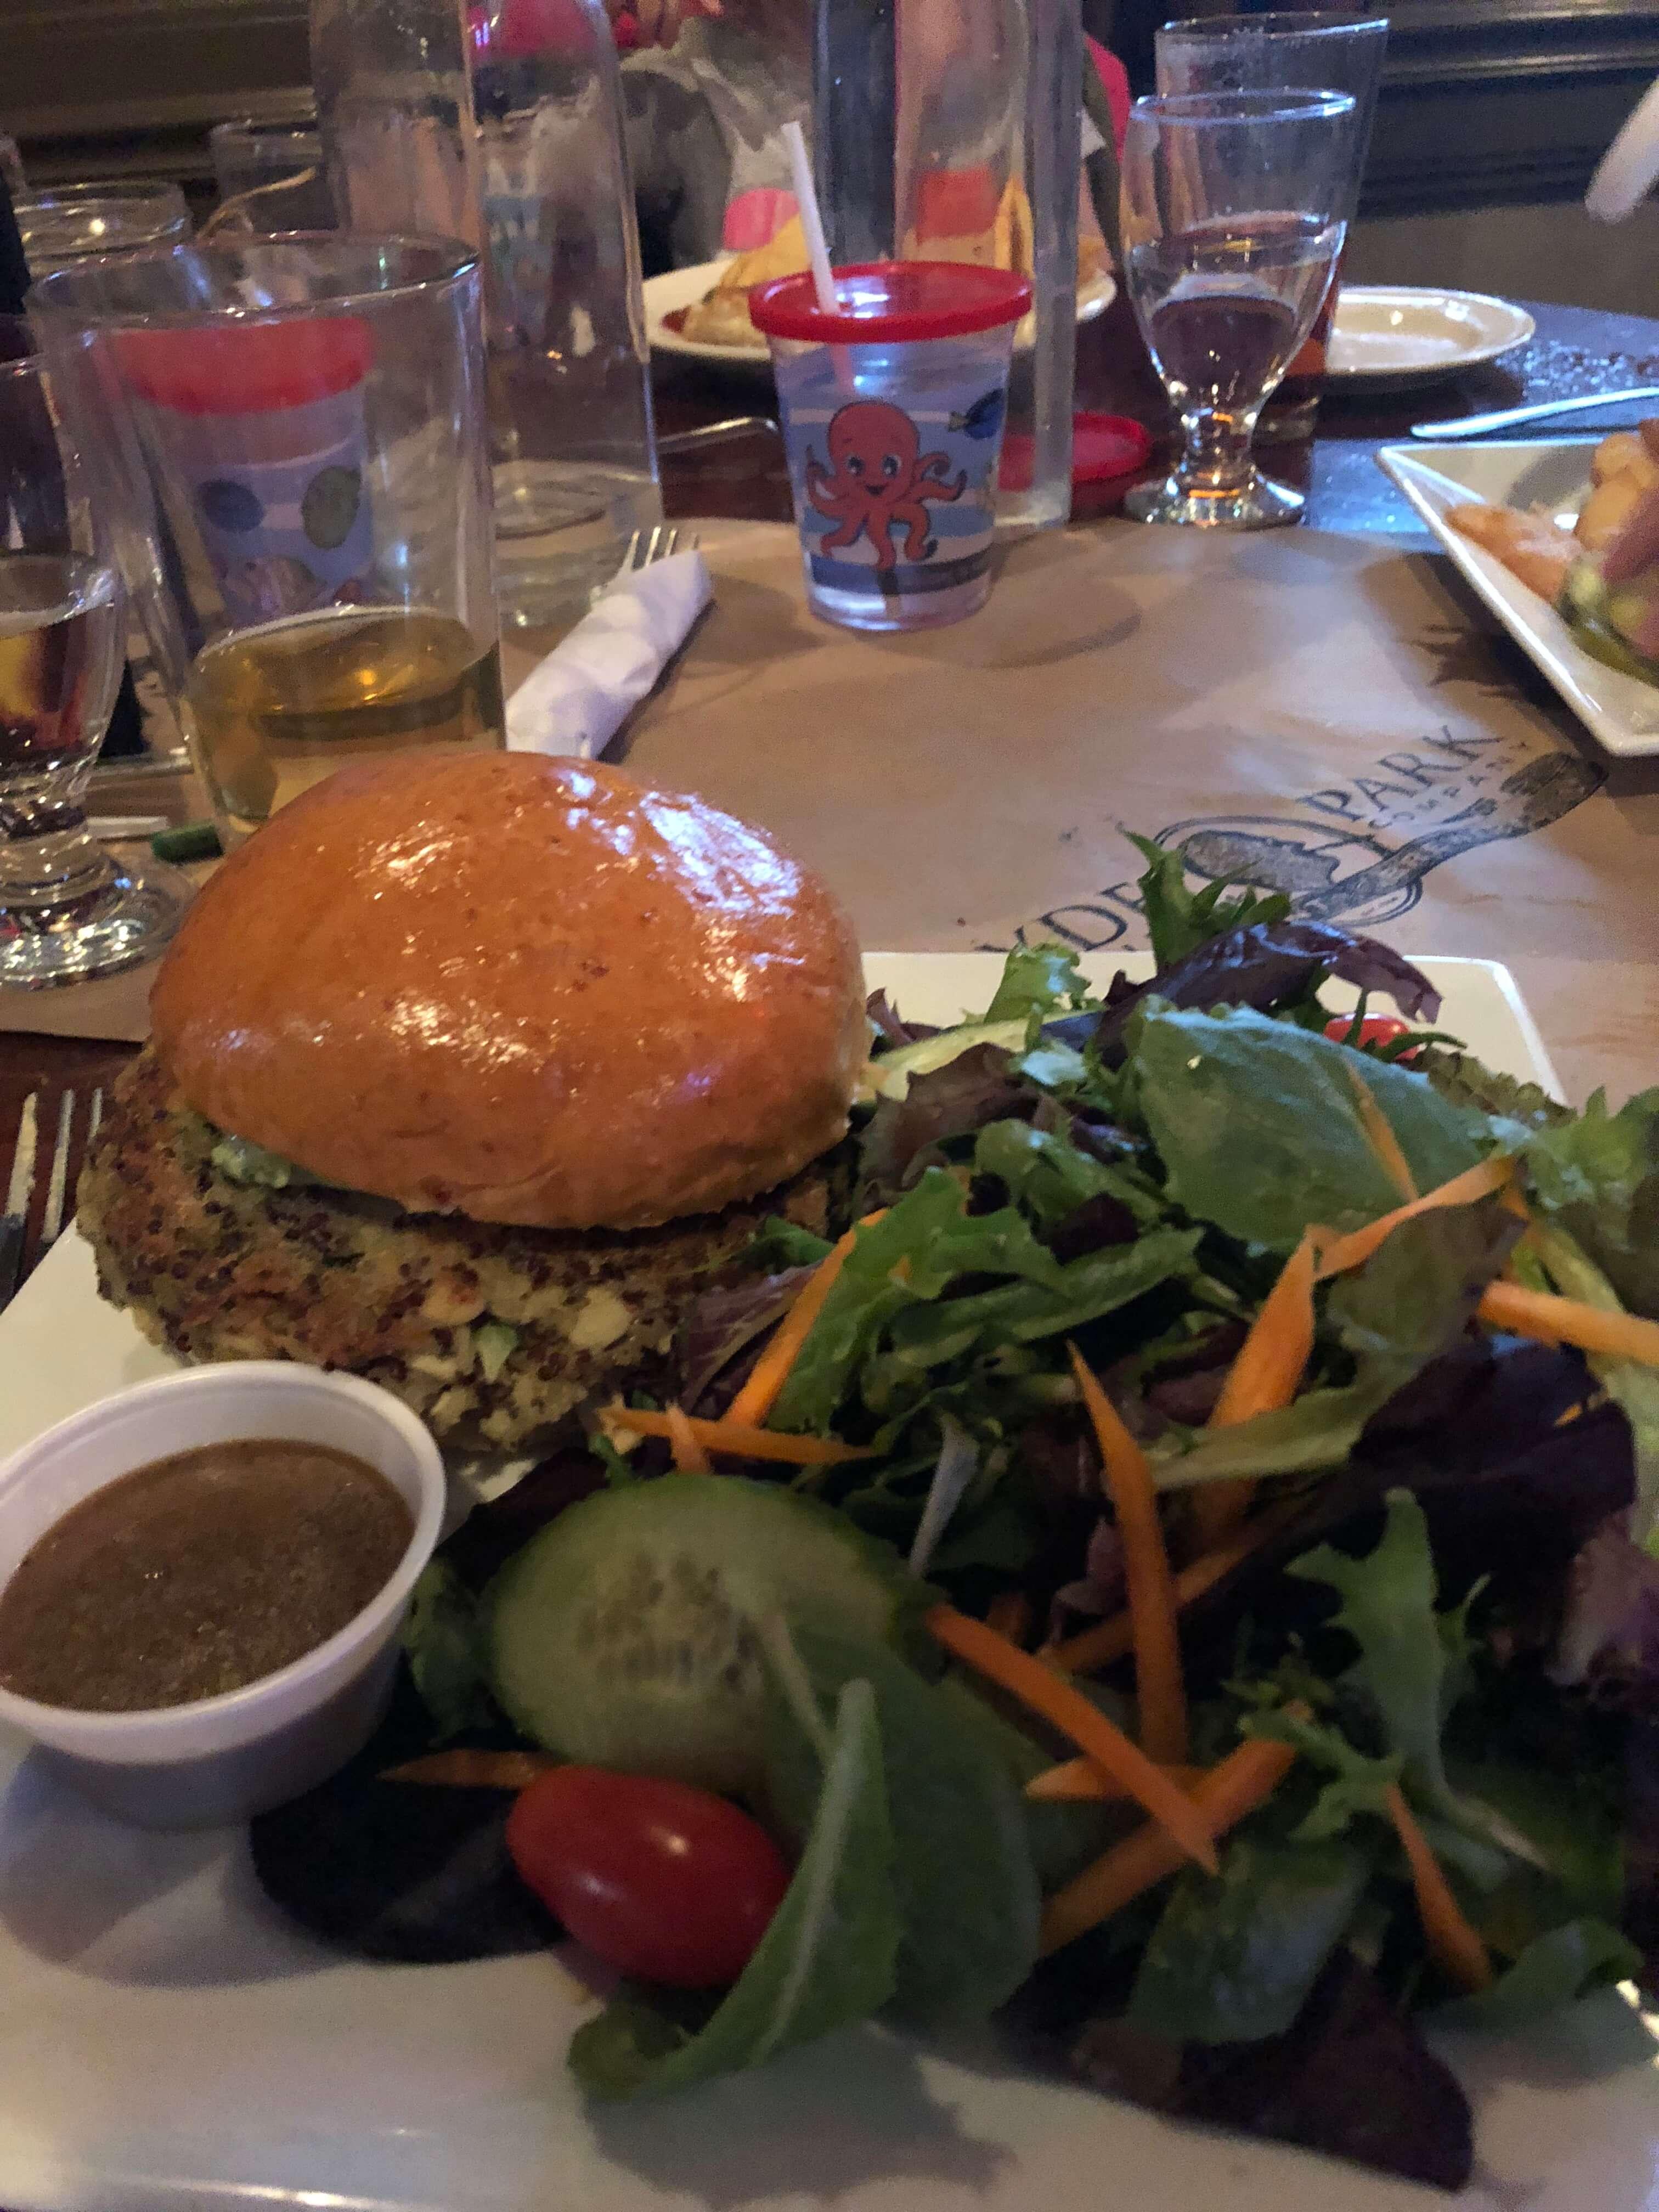 hyde park brewery dinner veggie burger dutchess county